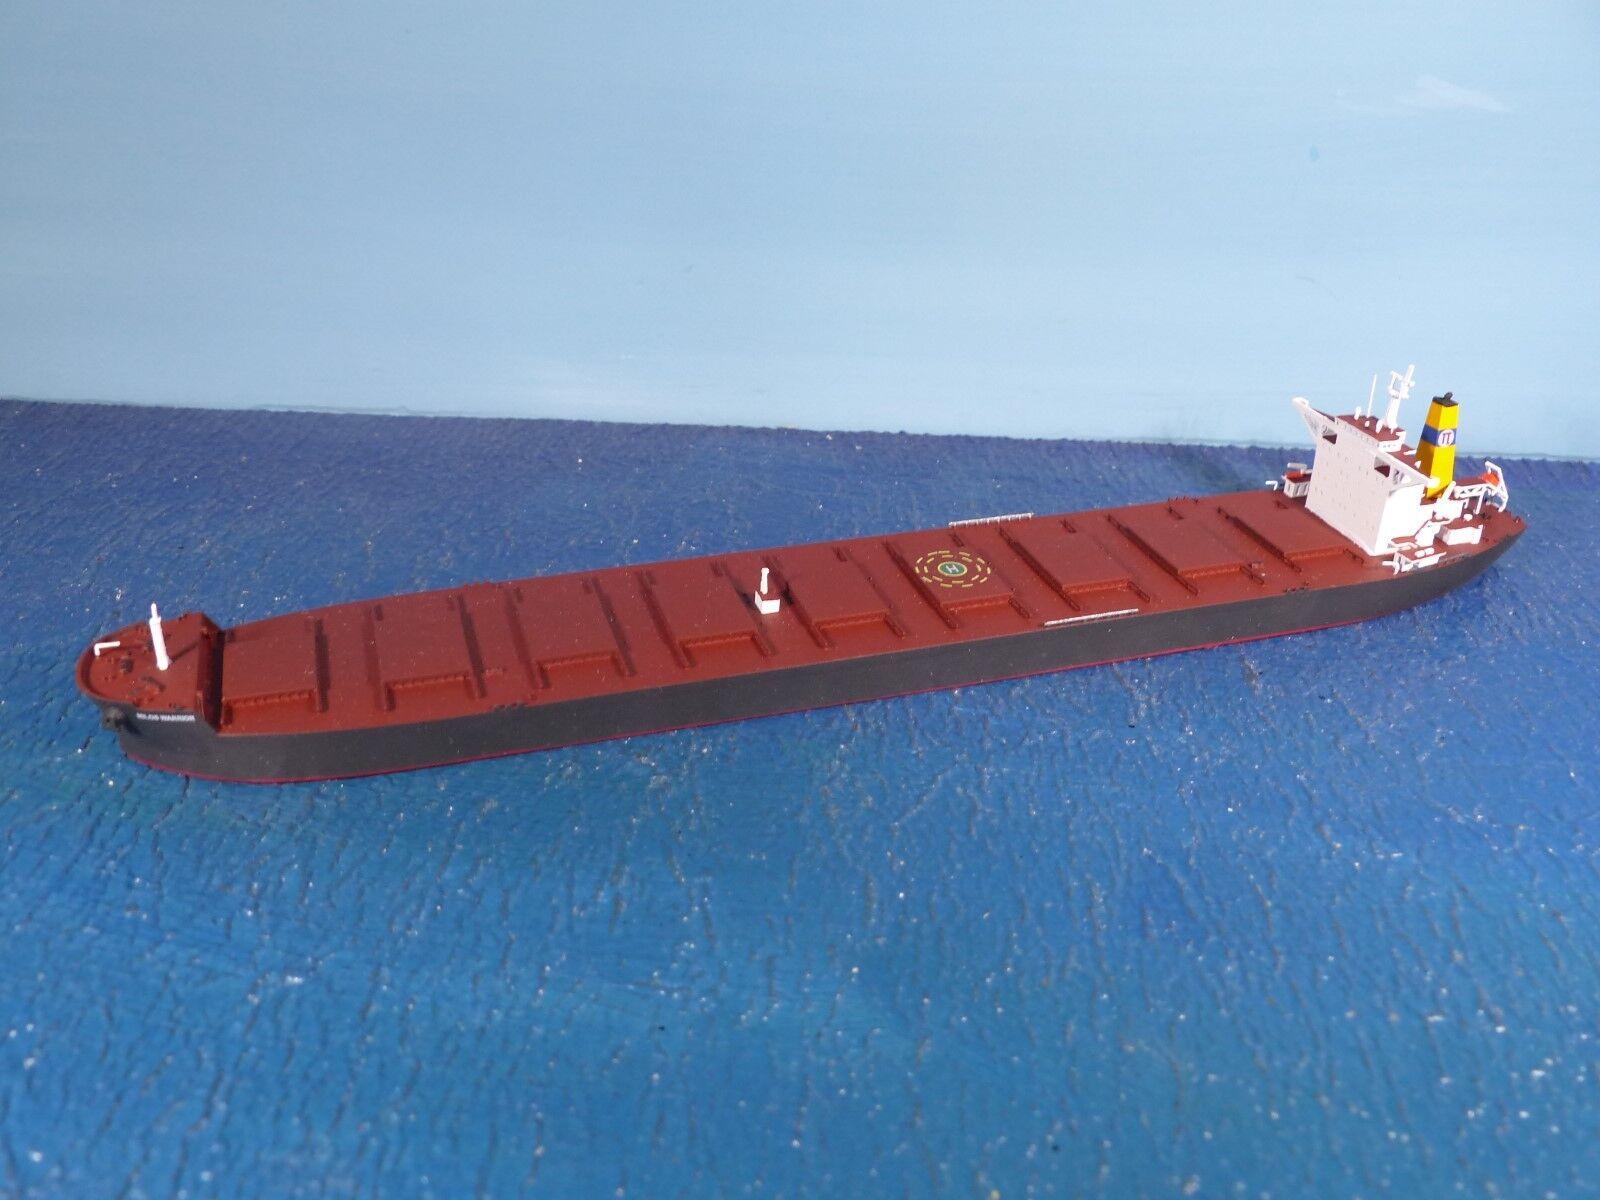 Rhenania junior 1 1250 bulkfrachter  milos krieger  der j - 332 ovp neuheit